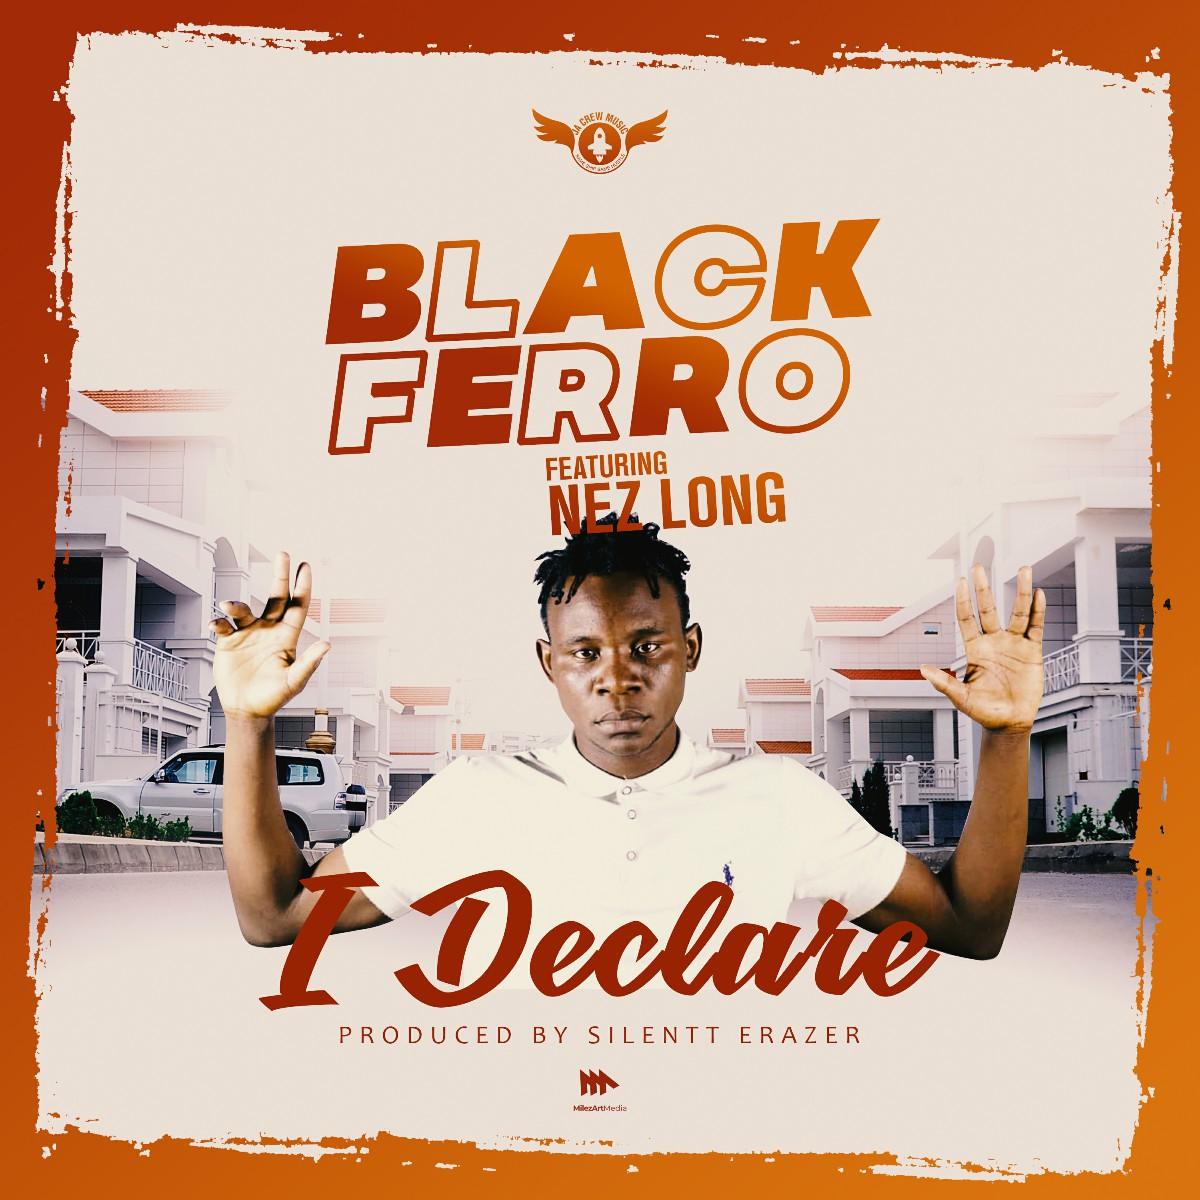 Black Ferro ft. Nez Long - I Declare